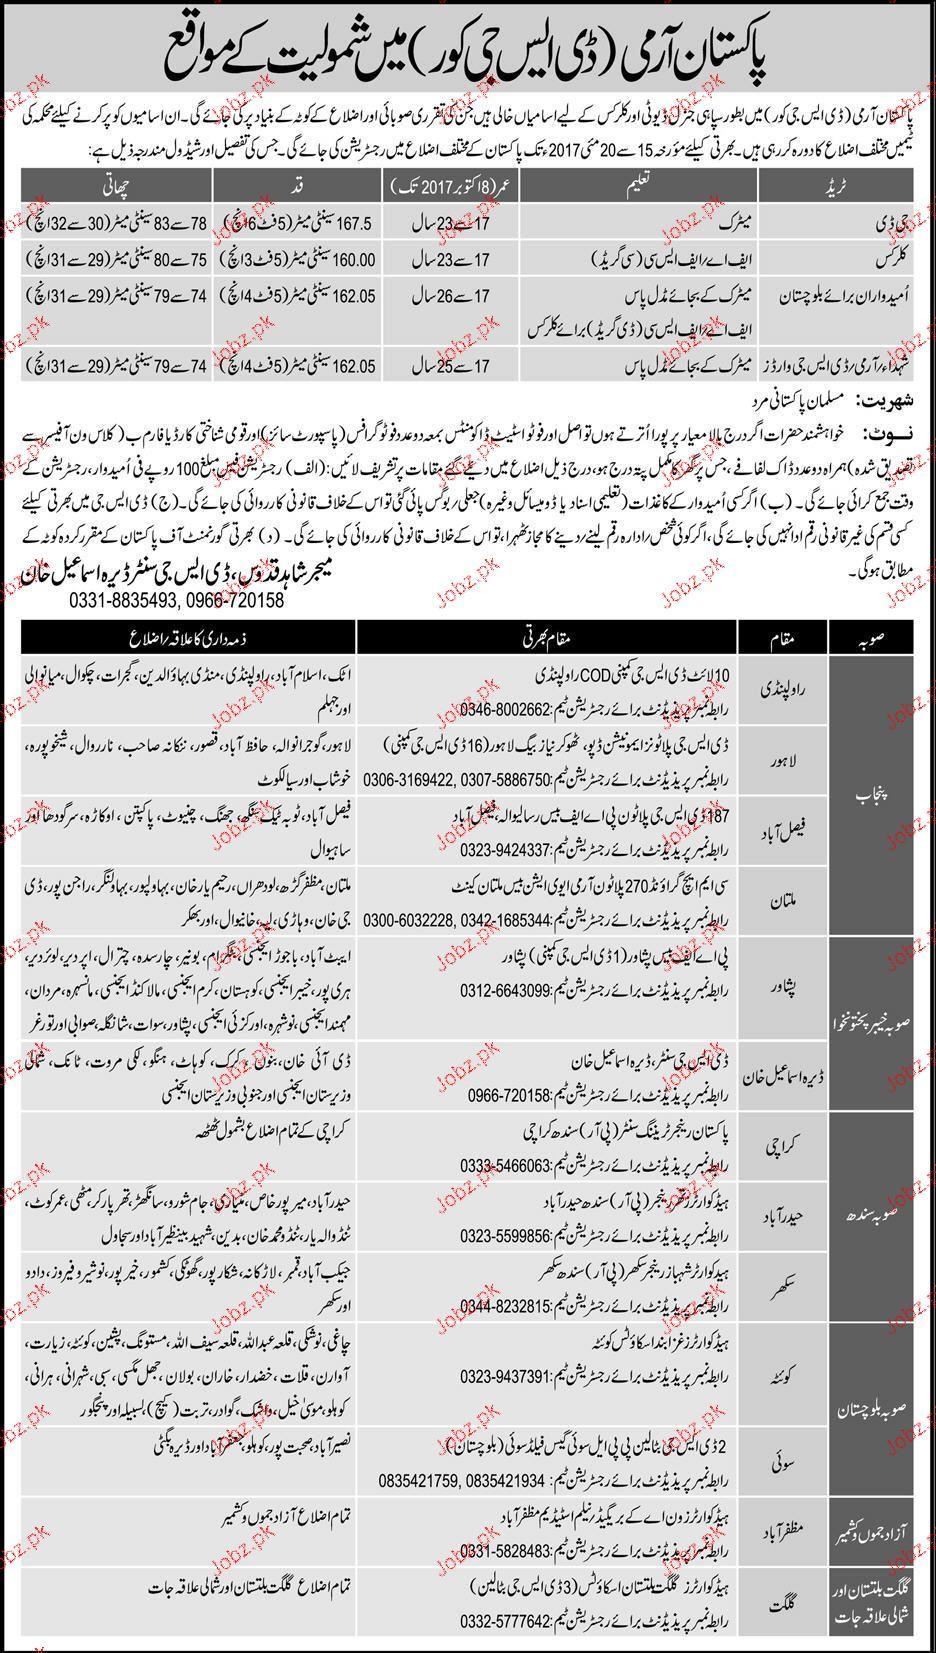 Pakistan Army DSG Corps Recruitment as GD, Clerks 2019 Job